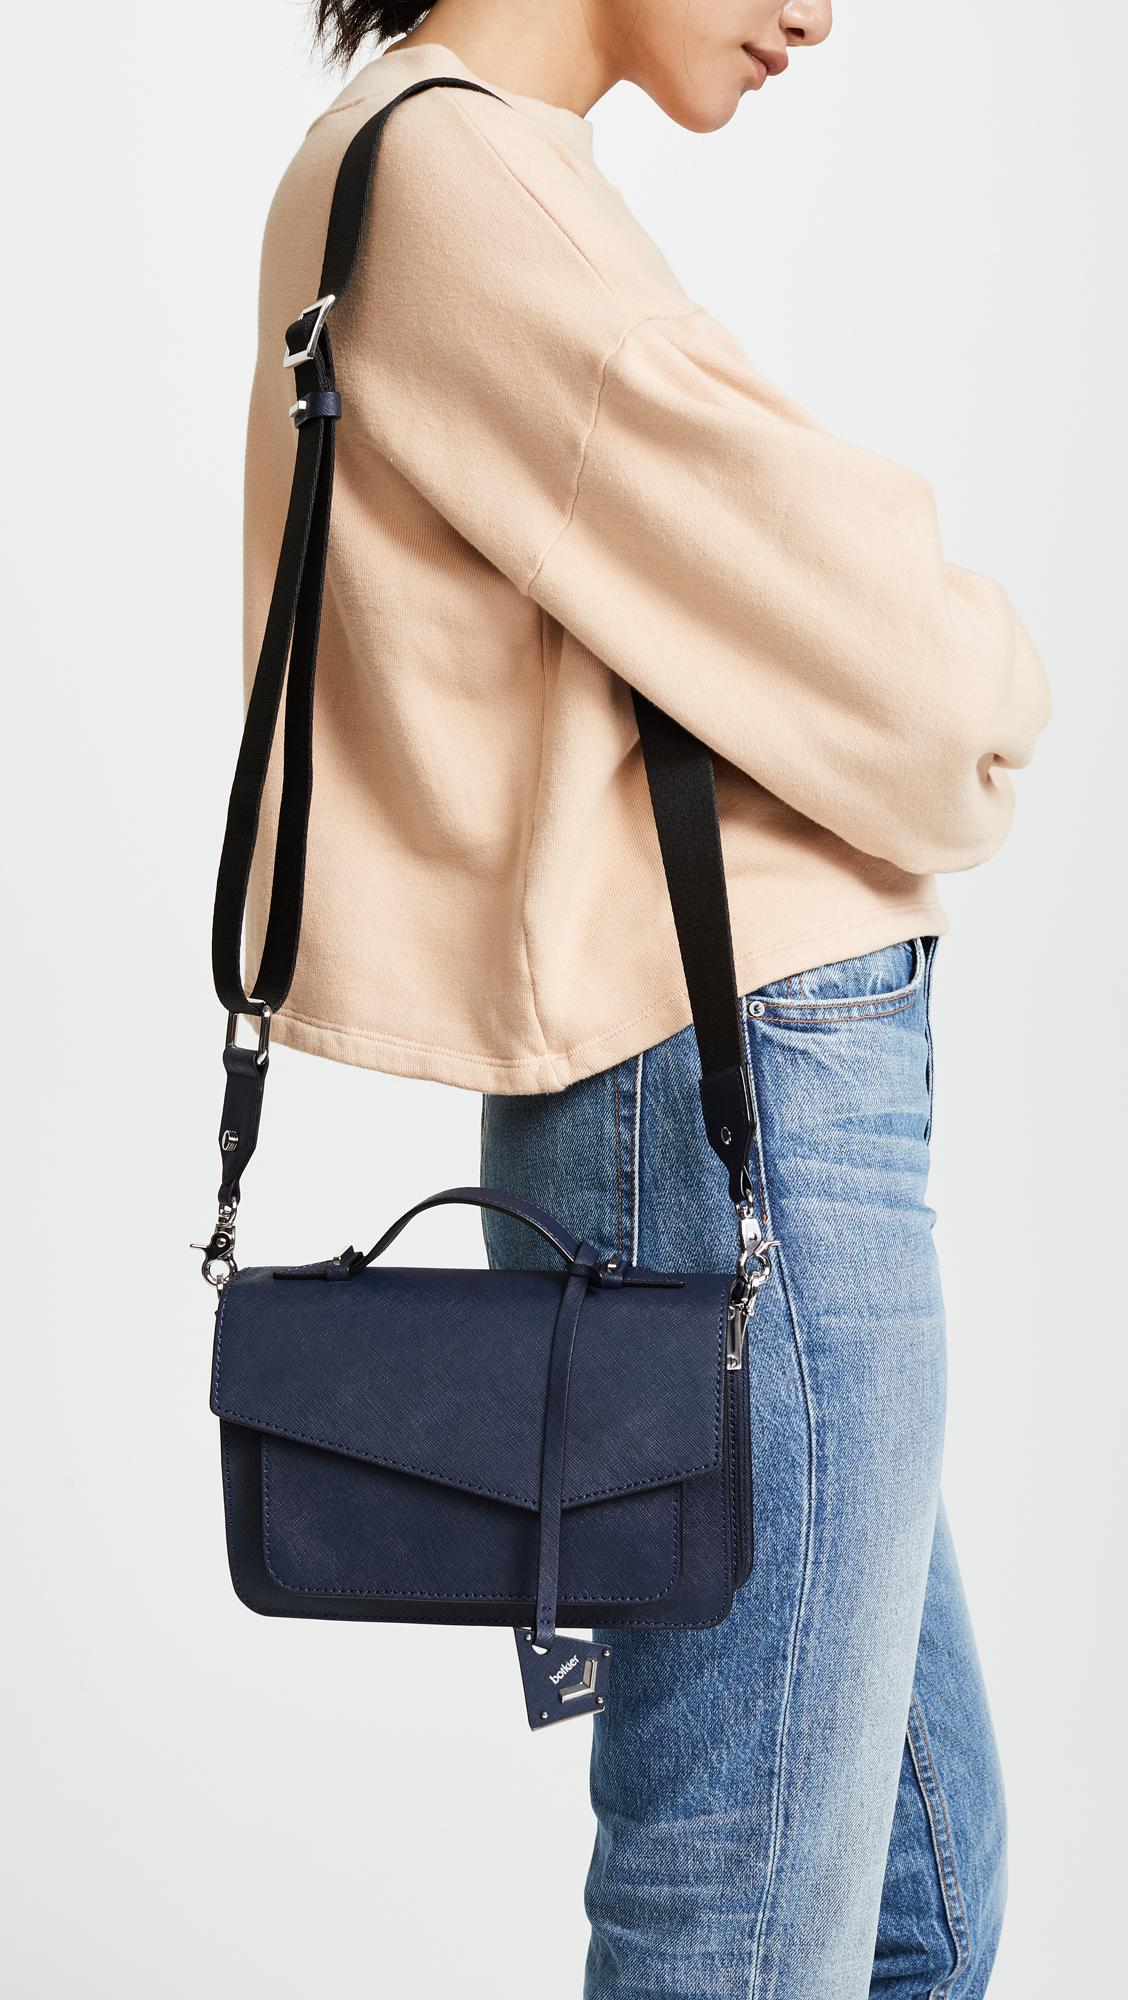 Botkier Womens Cobble Hill Crossbody Bag